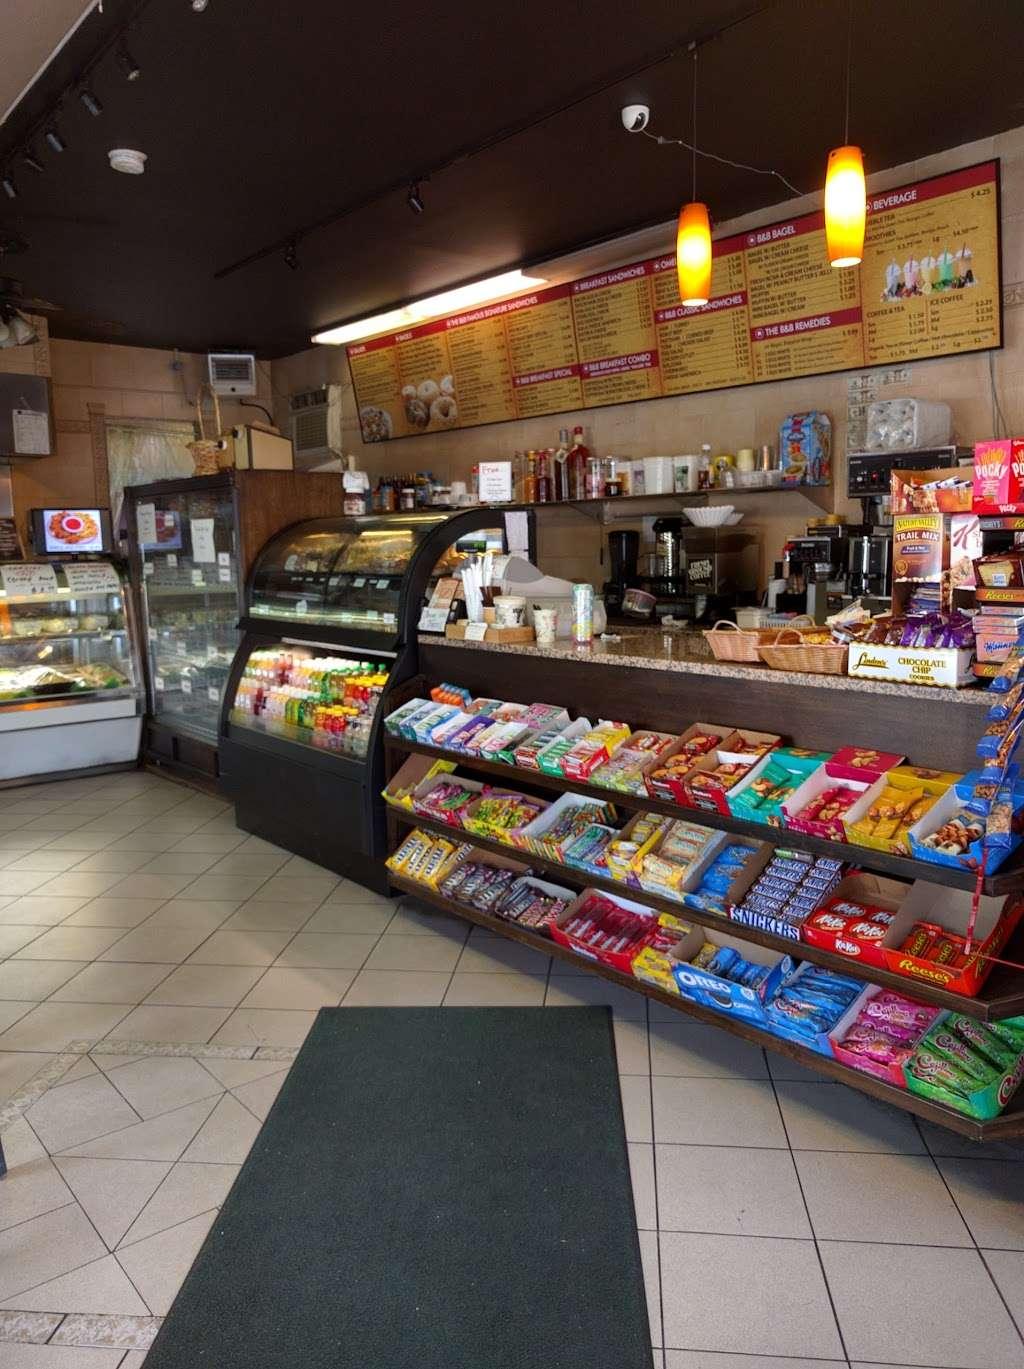 Bagel & Bagel - bakery  | Photo 3 of 9 | Address: 775 Edgewater Ave, Ridgefield, NJ 07657, USA | Phone: (201) 941-5626